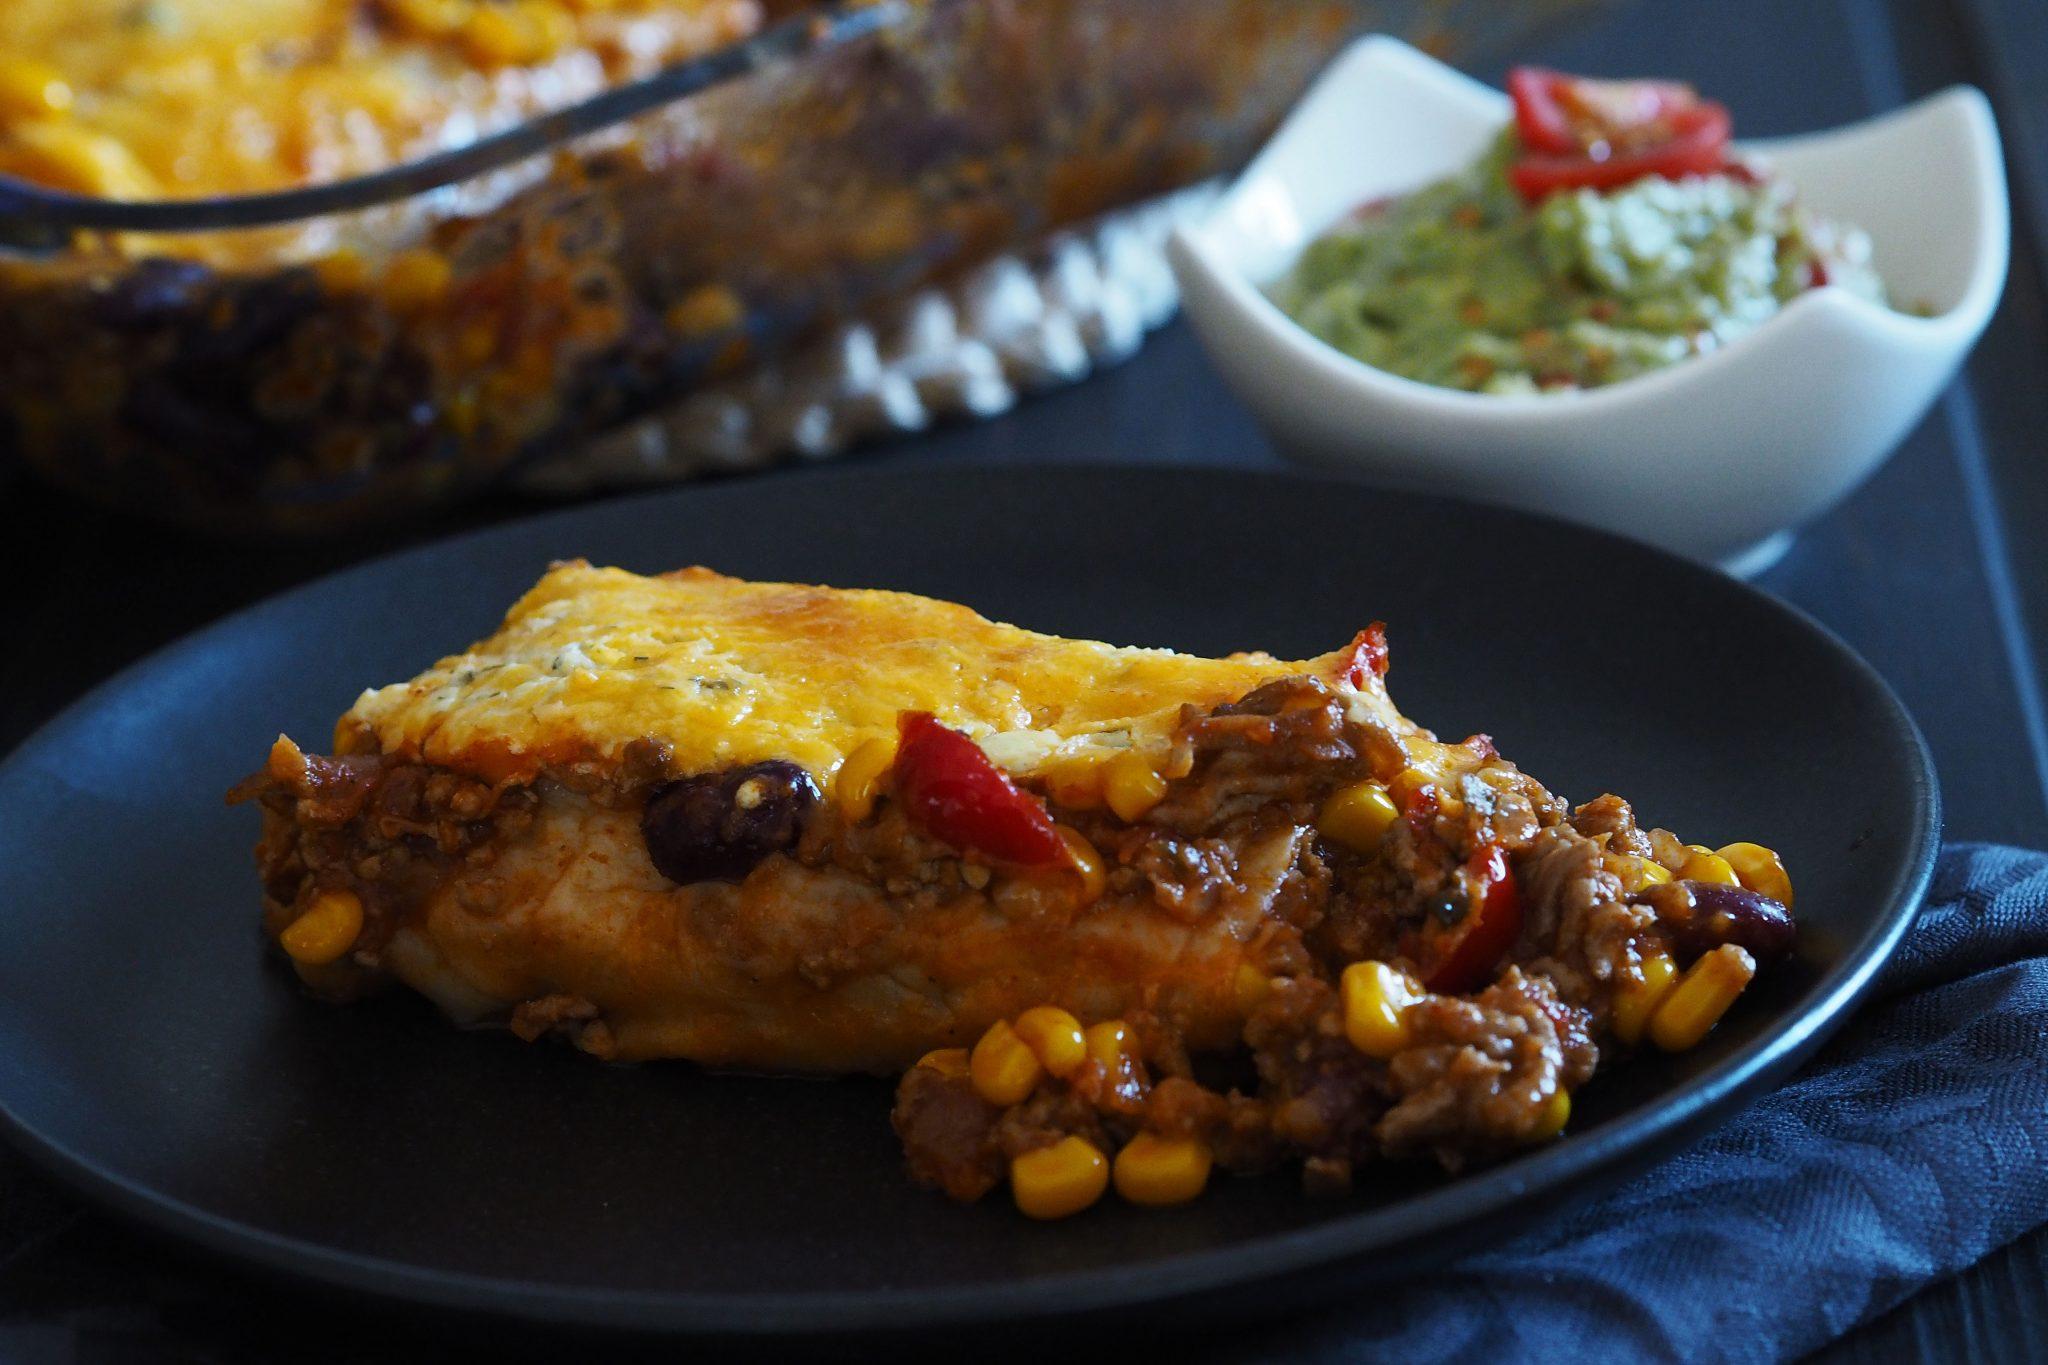 Überbackene Enchiladas mit Avocado-Dip